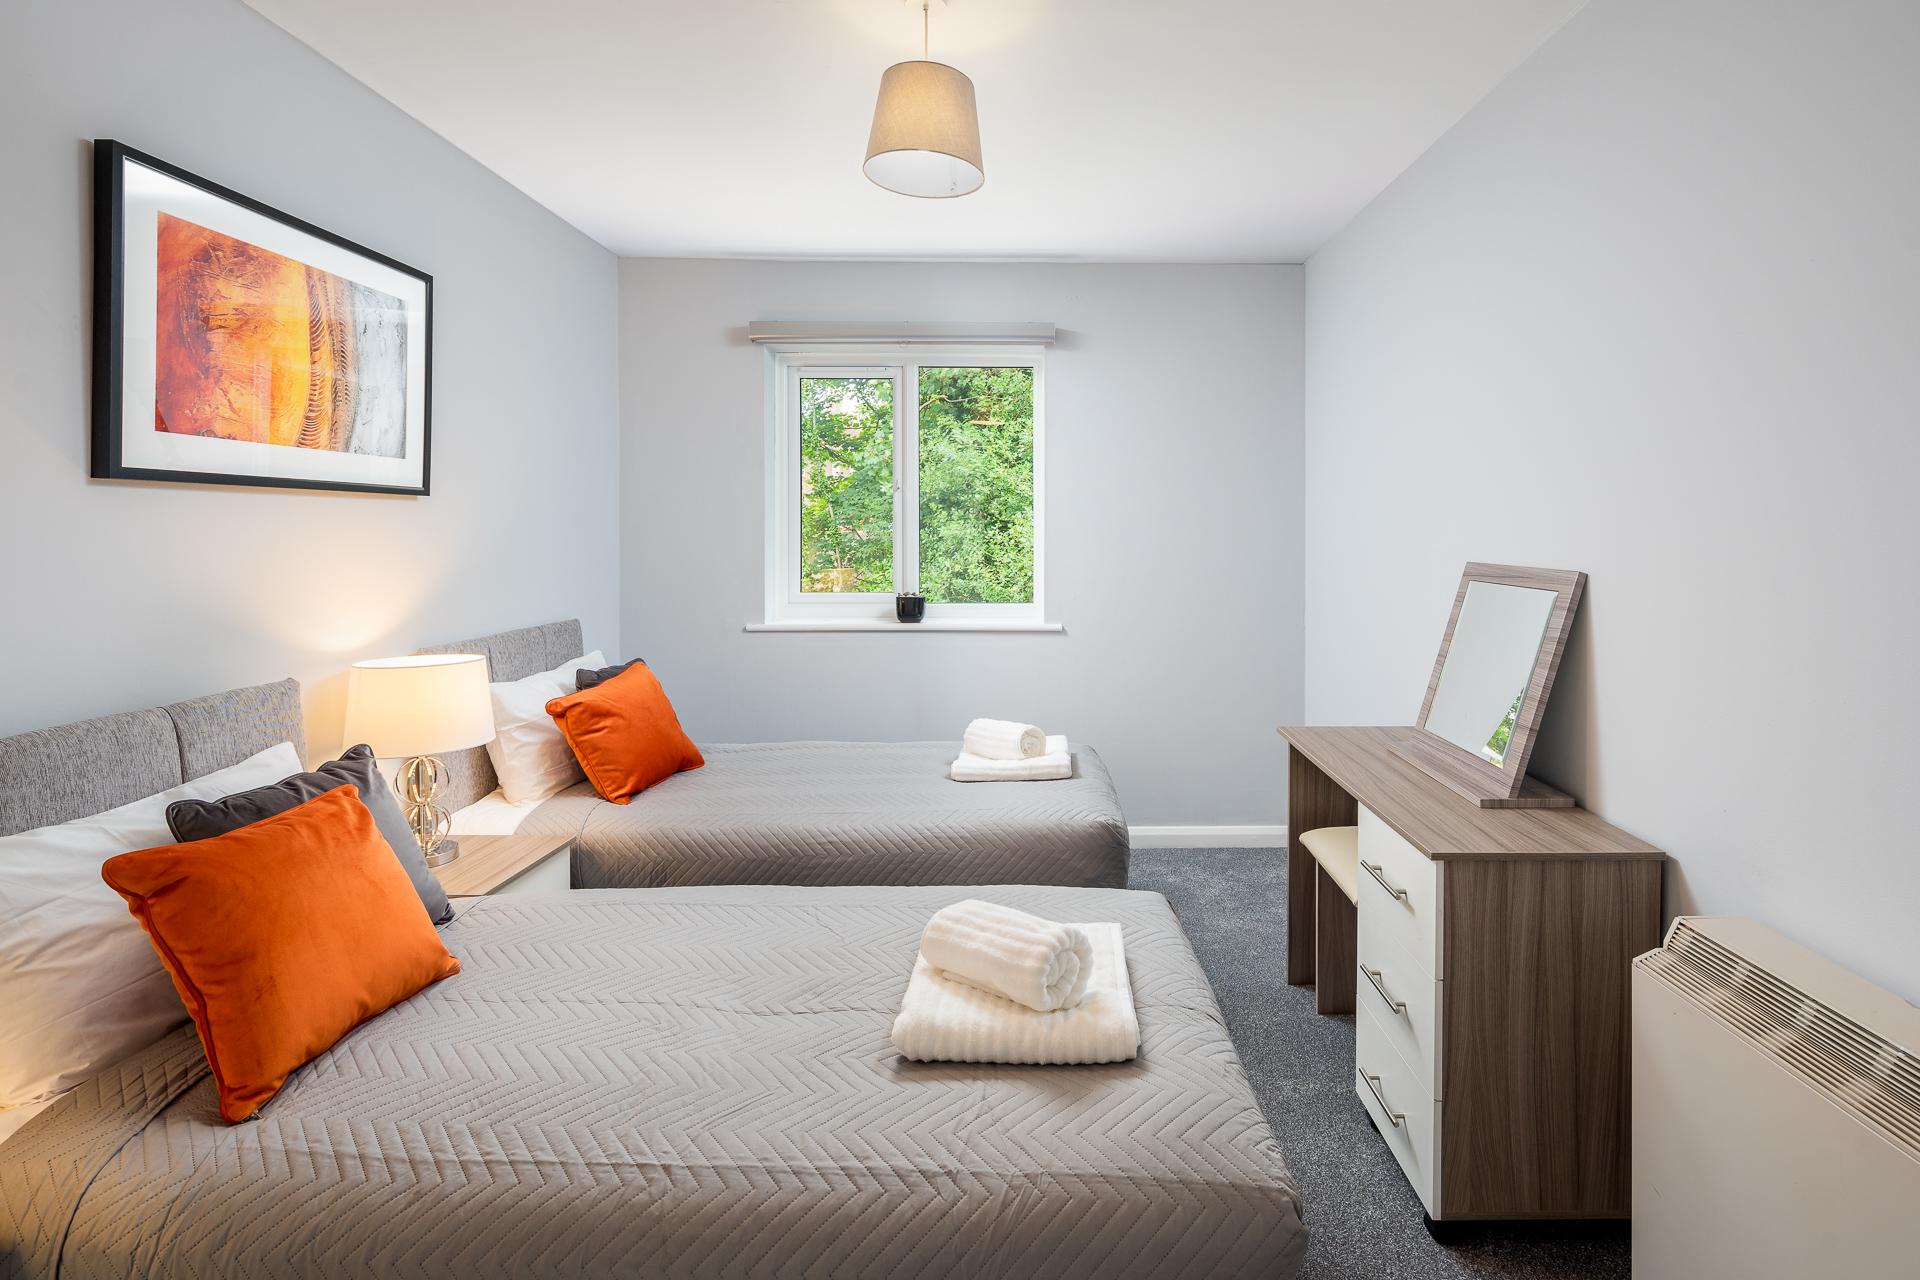 Bedding at Crawley Centre Apartment, Southgate, Crawley